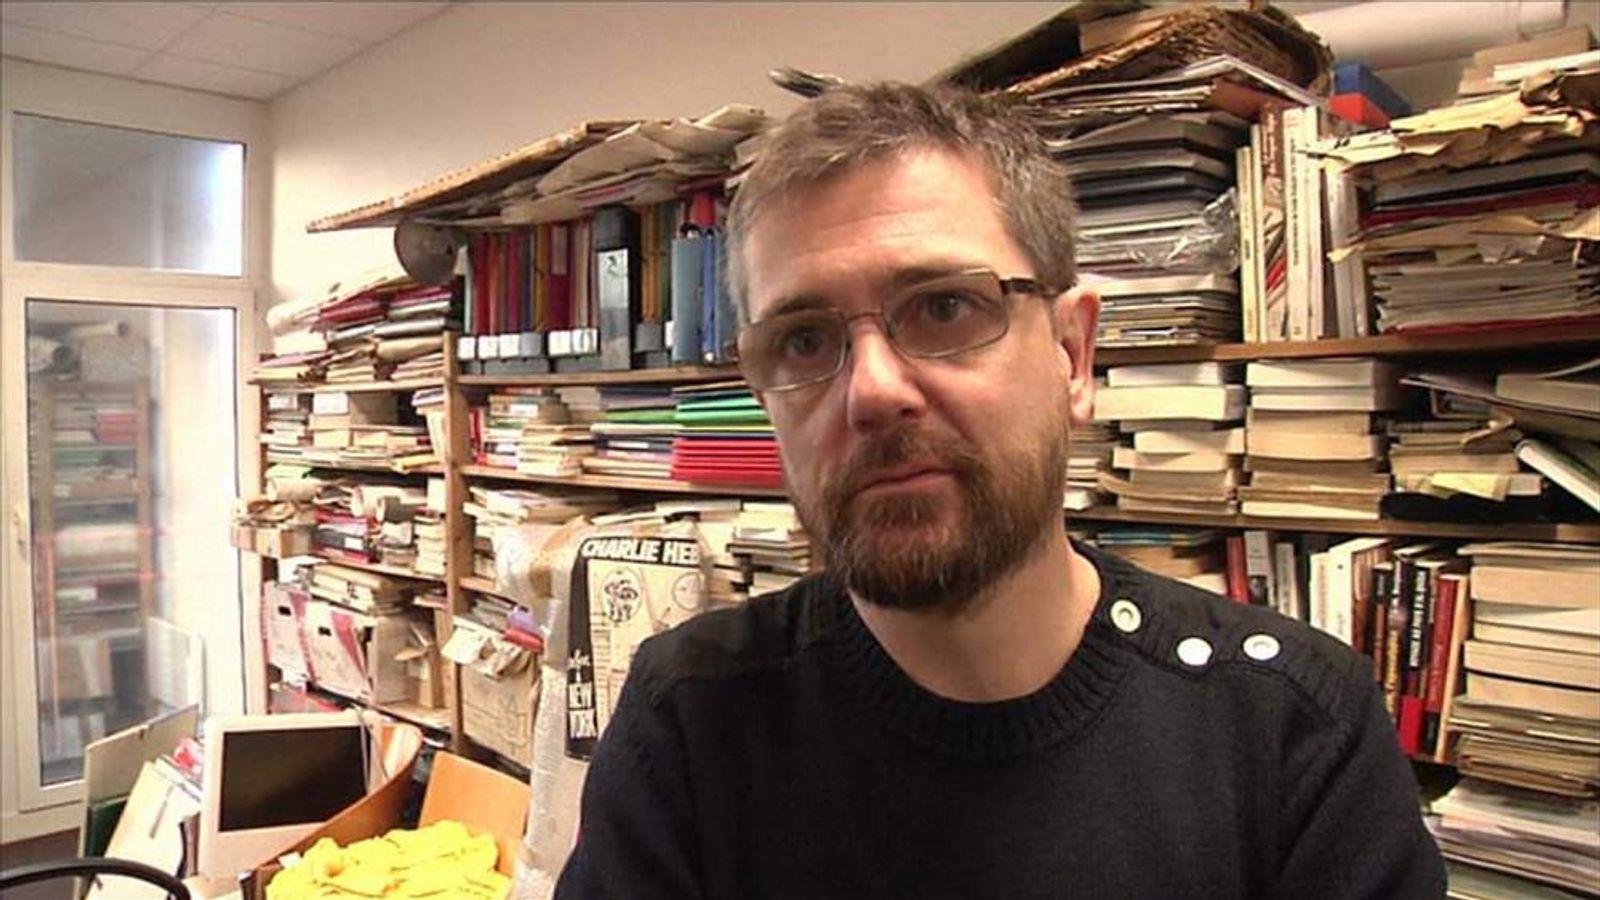 Charlie Hebdo editor Stephane Charbonnier in January 2013